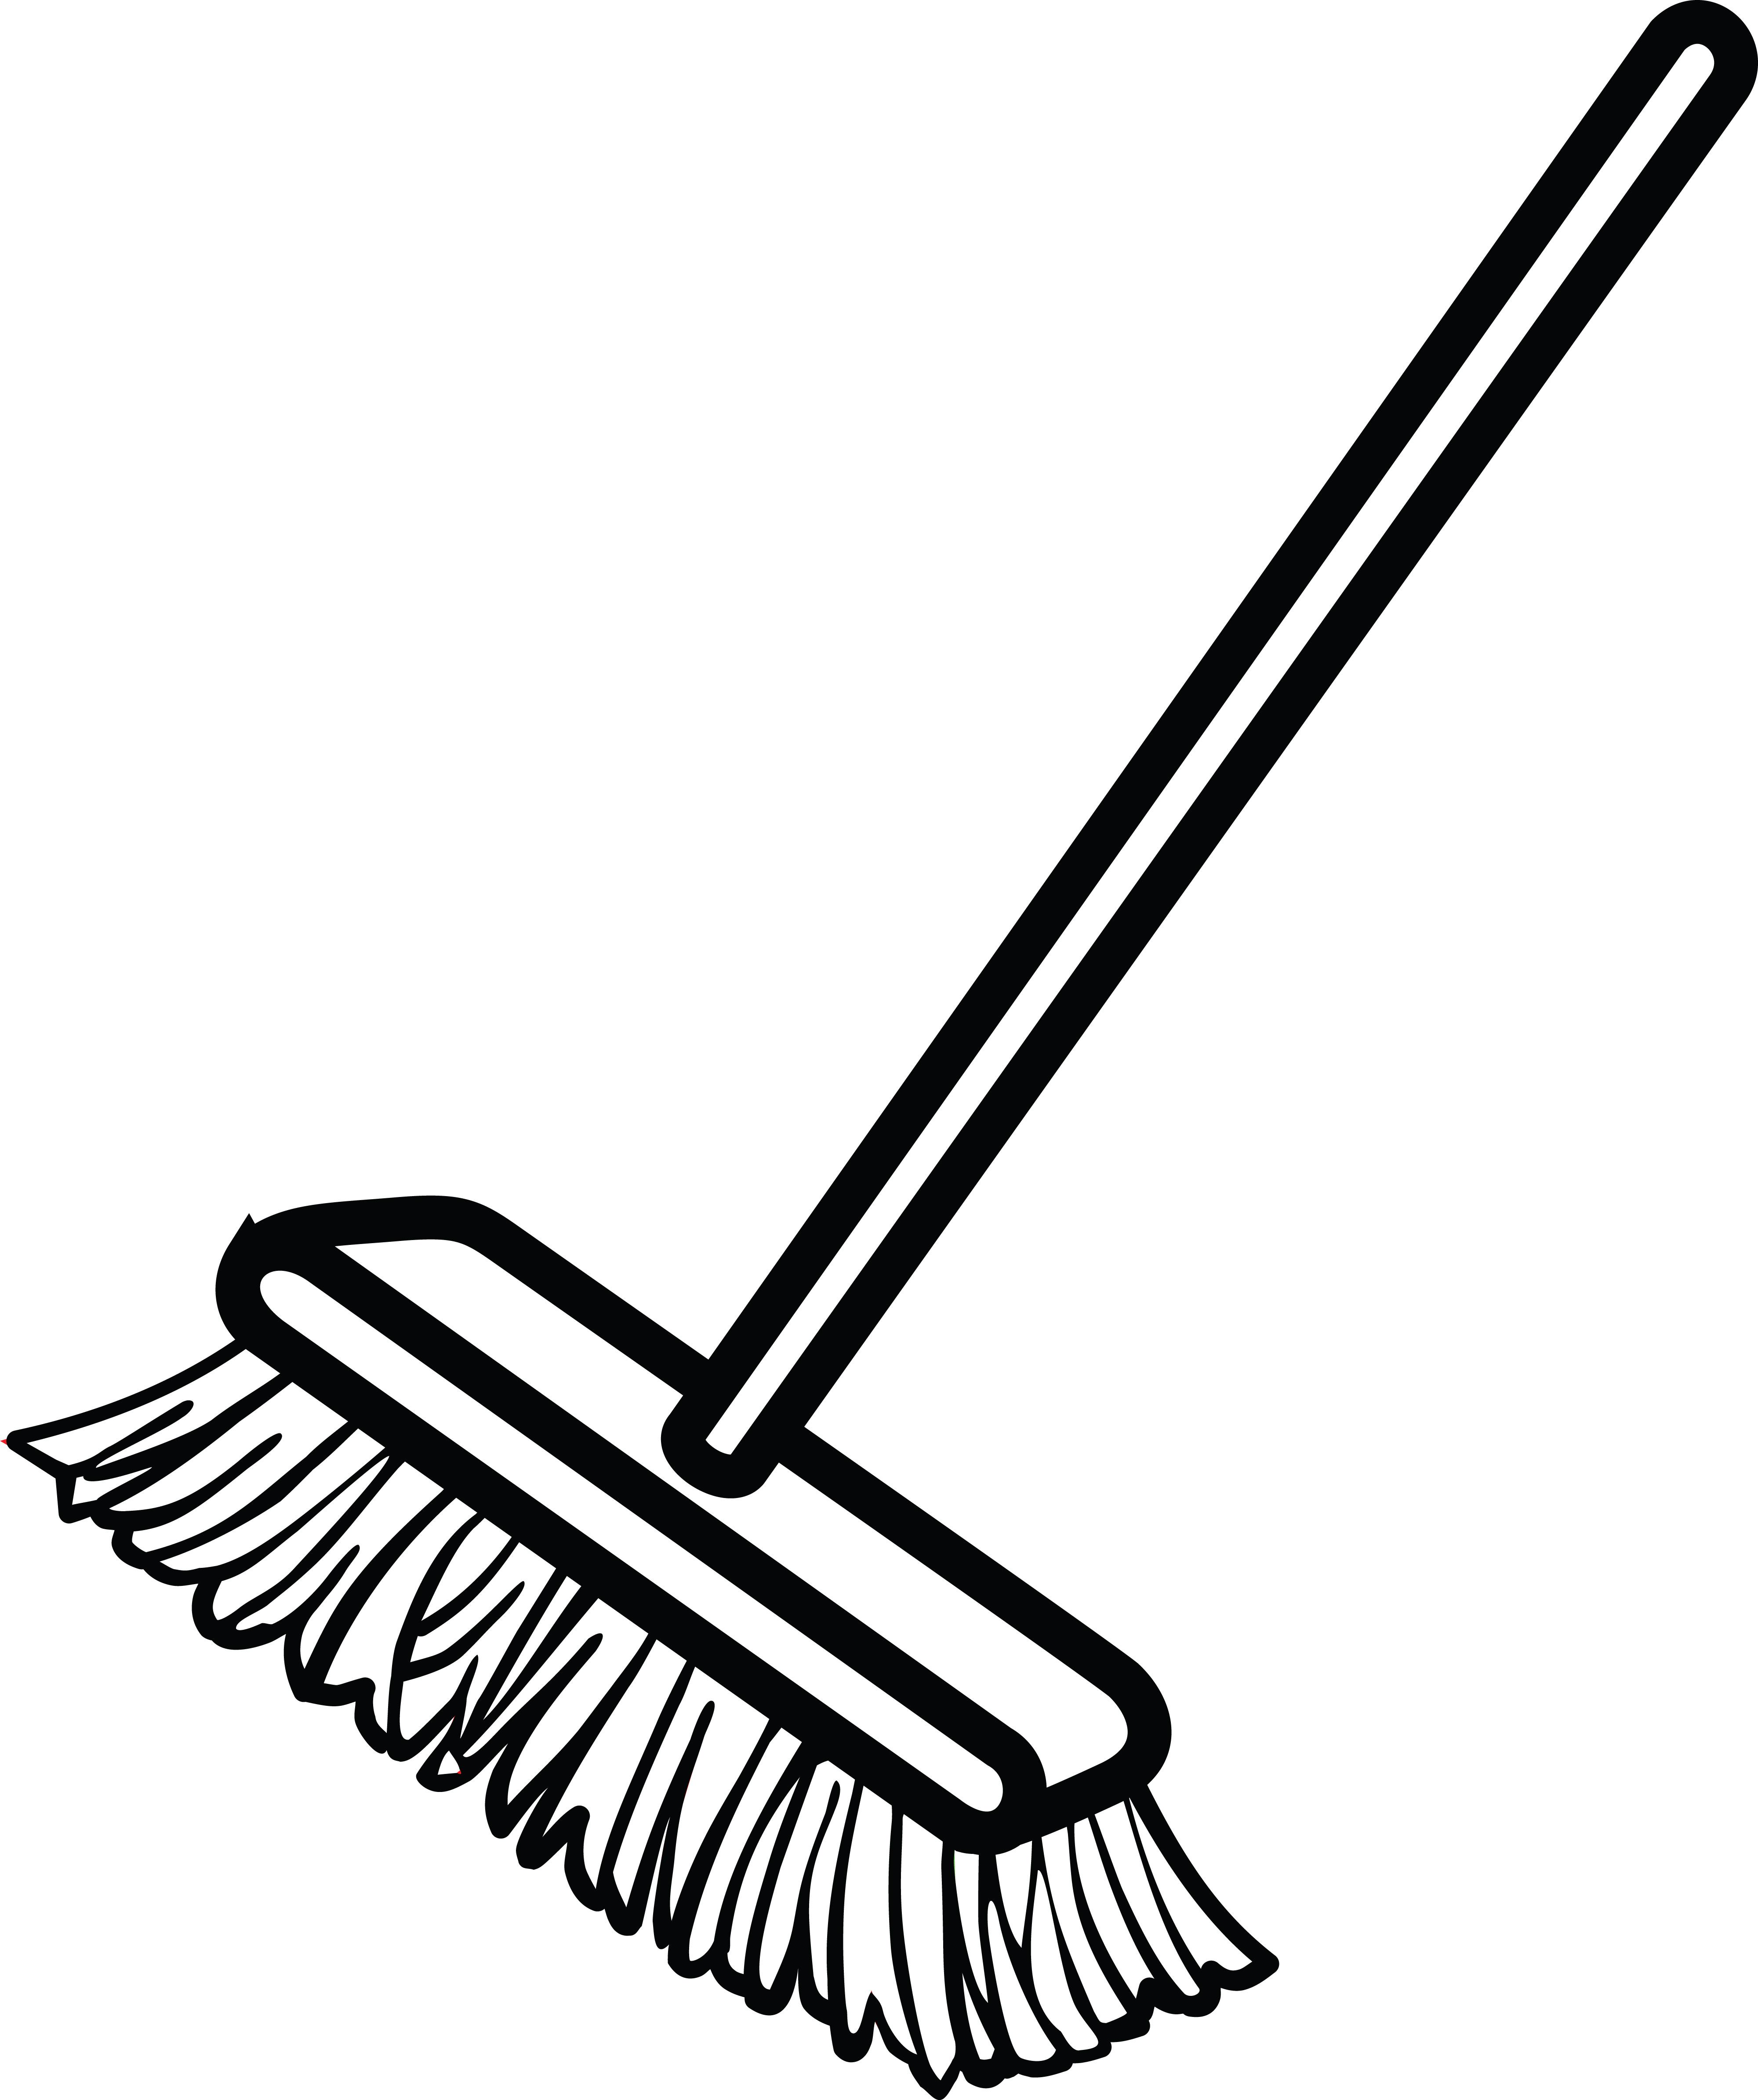 Broom Drawing